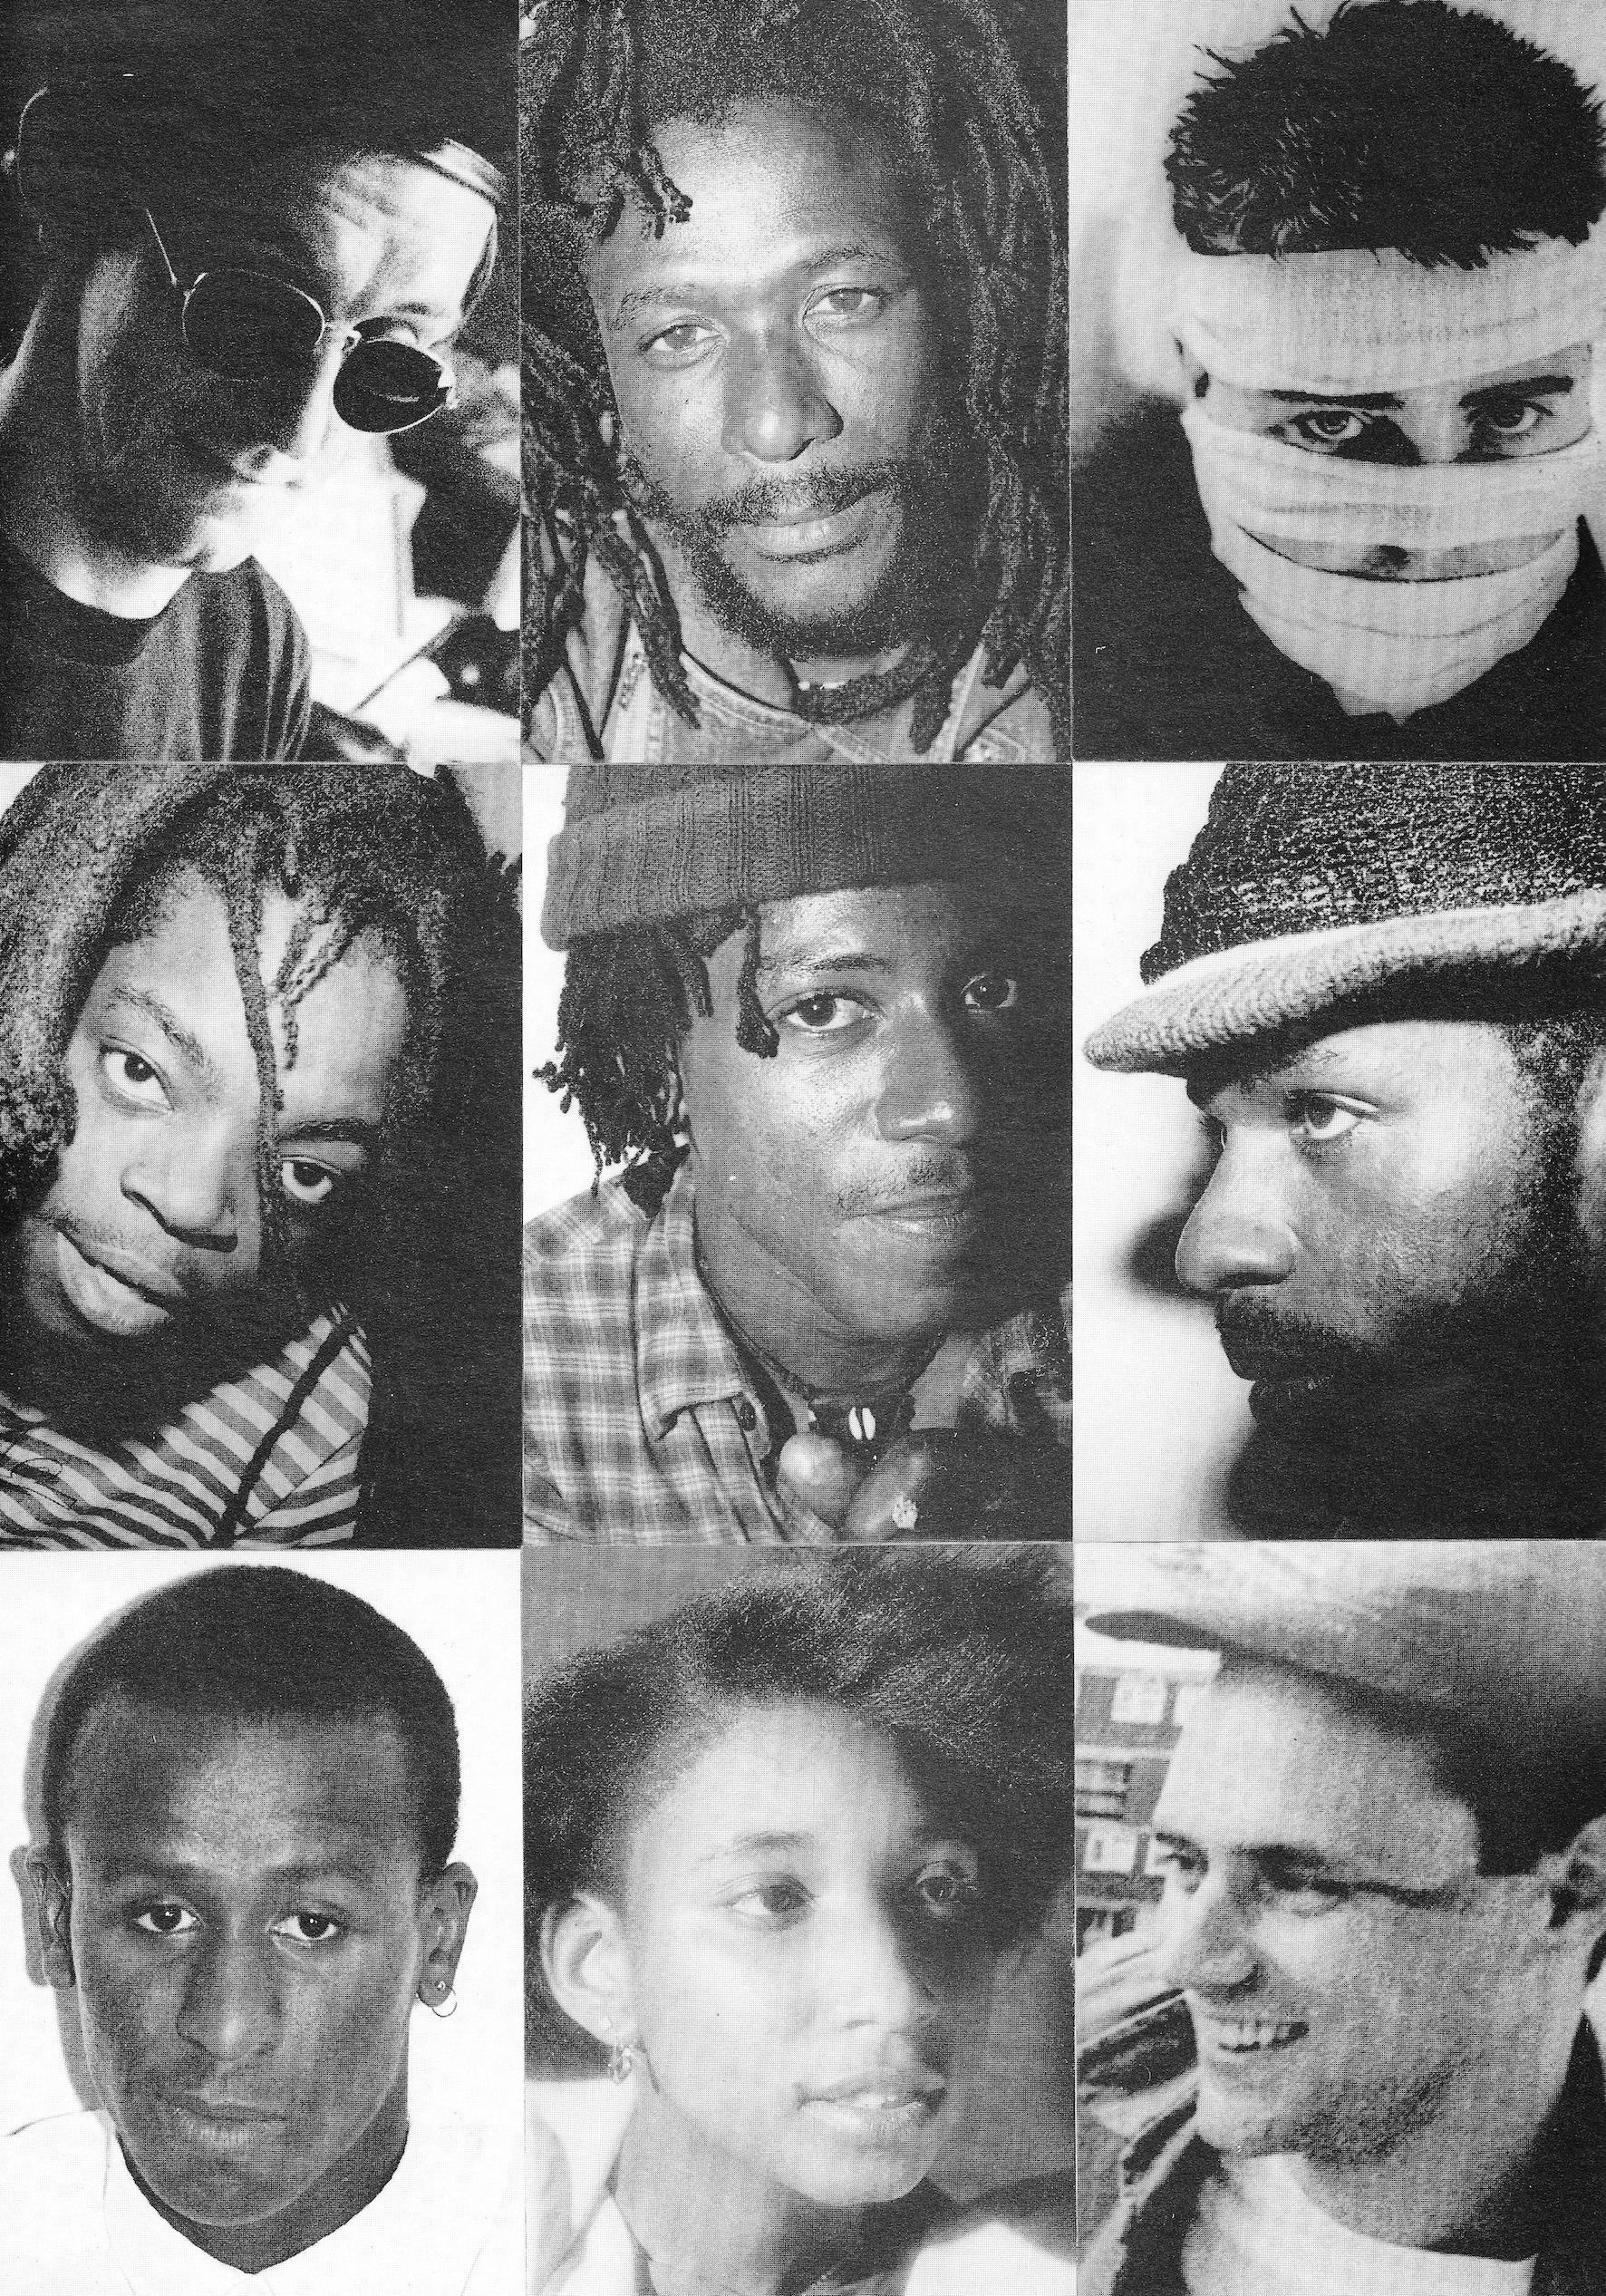 Dr Pablo / Congo Ashanti Roy / Gary Clail / Crucial Tony / Dan Sheals / Shara Nelson / Kendall Ernest / Mr Magoo / Style Scott